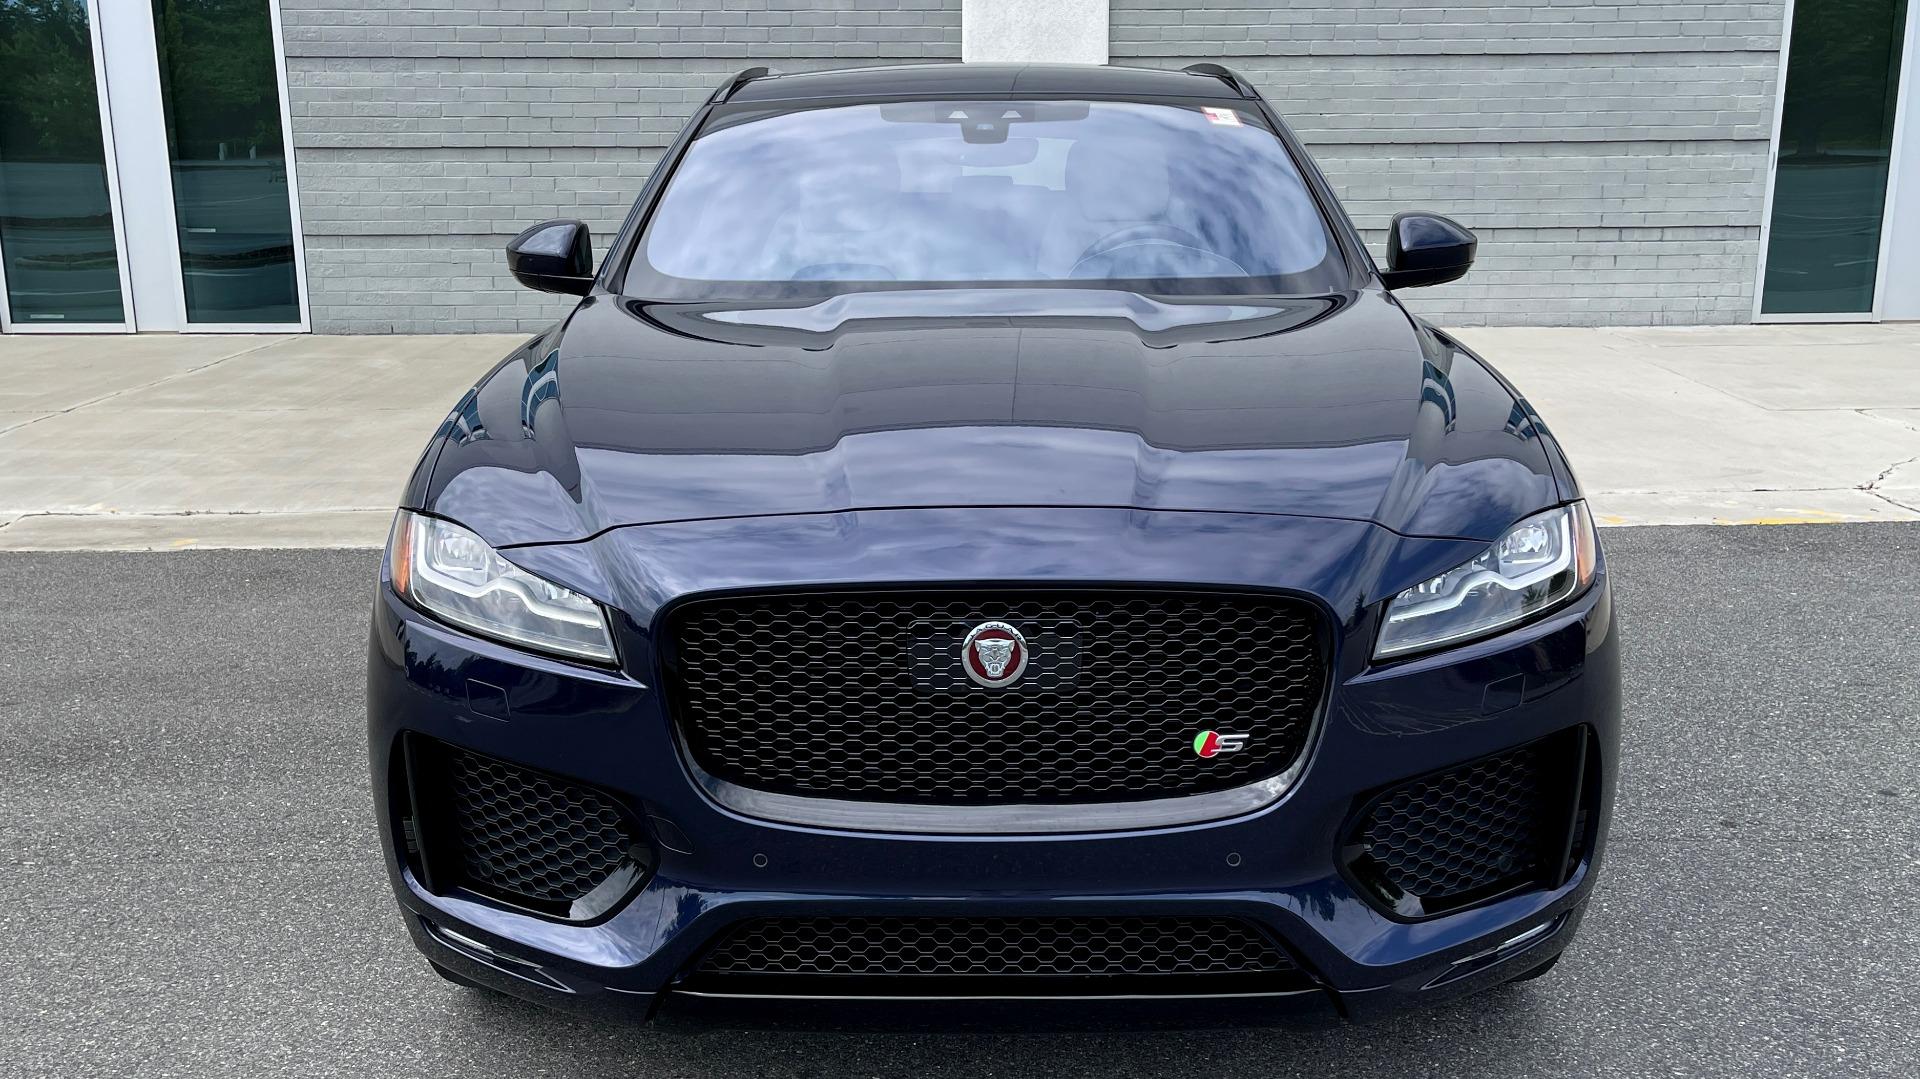 Used 2019 Jaguar F-PACE S / DRIVE PKG / BSA / HUD / BLACK EXT PKG / REARVIEW for sale $50,995 at Formula Imports in Charlotte NC 28227 11